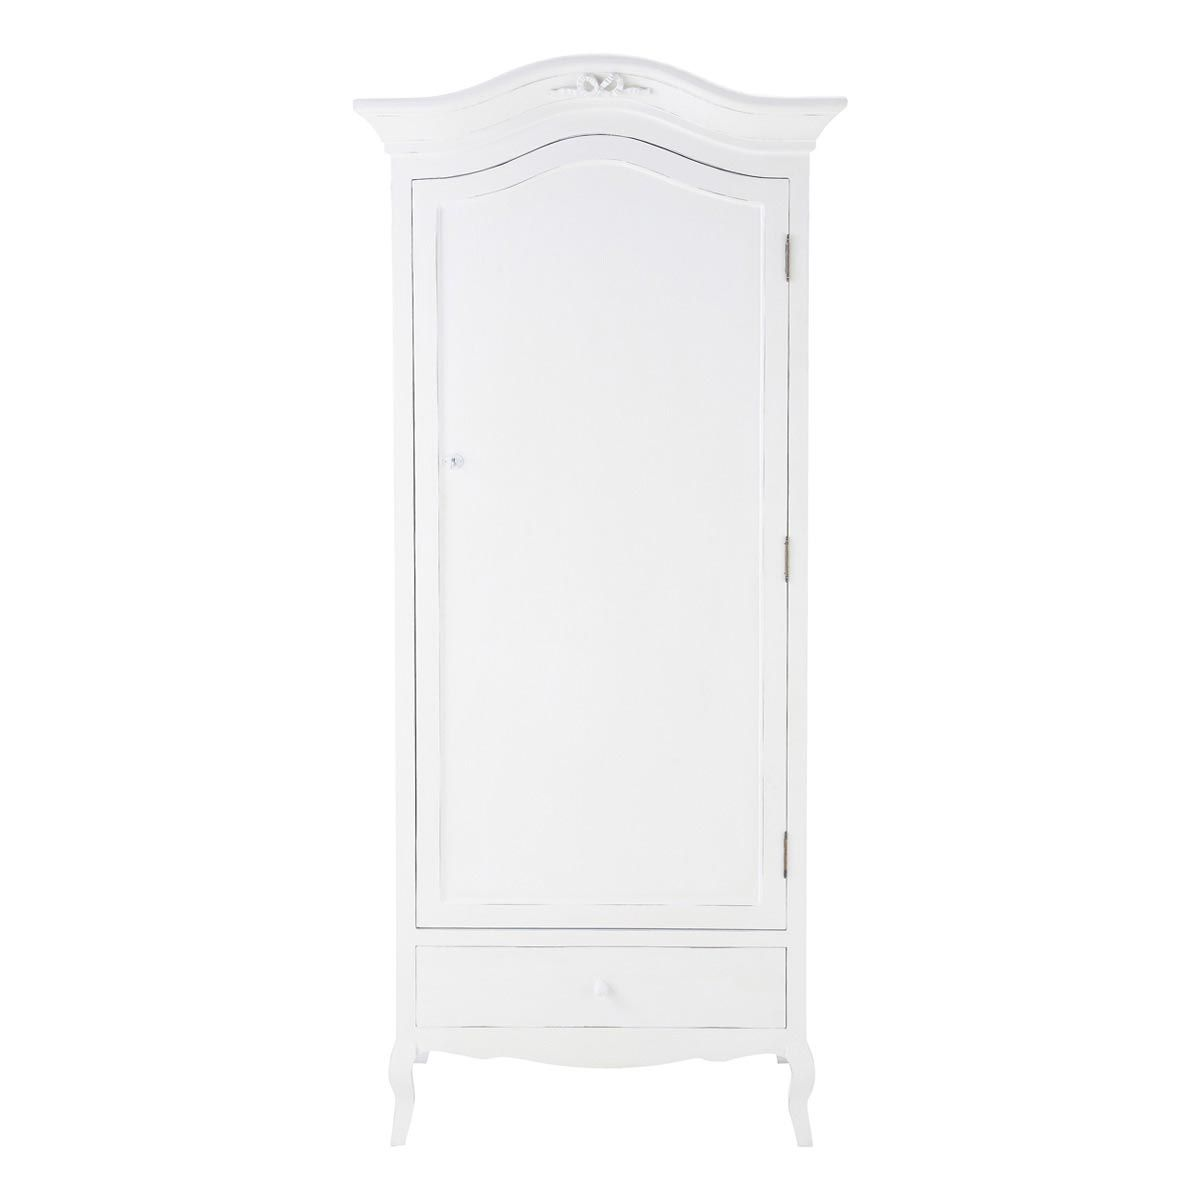 Wooden wardrobe in white W 90cm | Armoires en bois, Bois blanc et ...